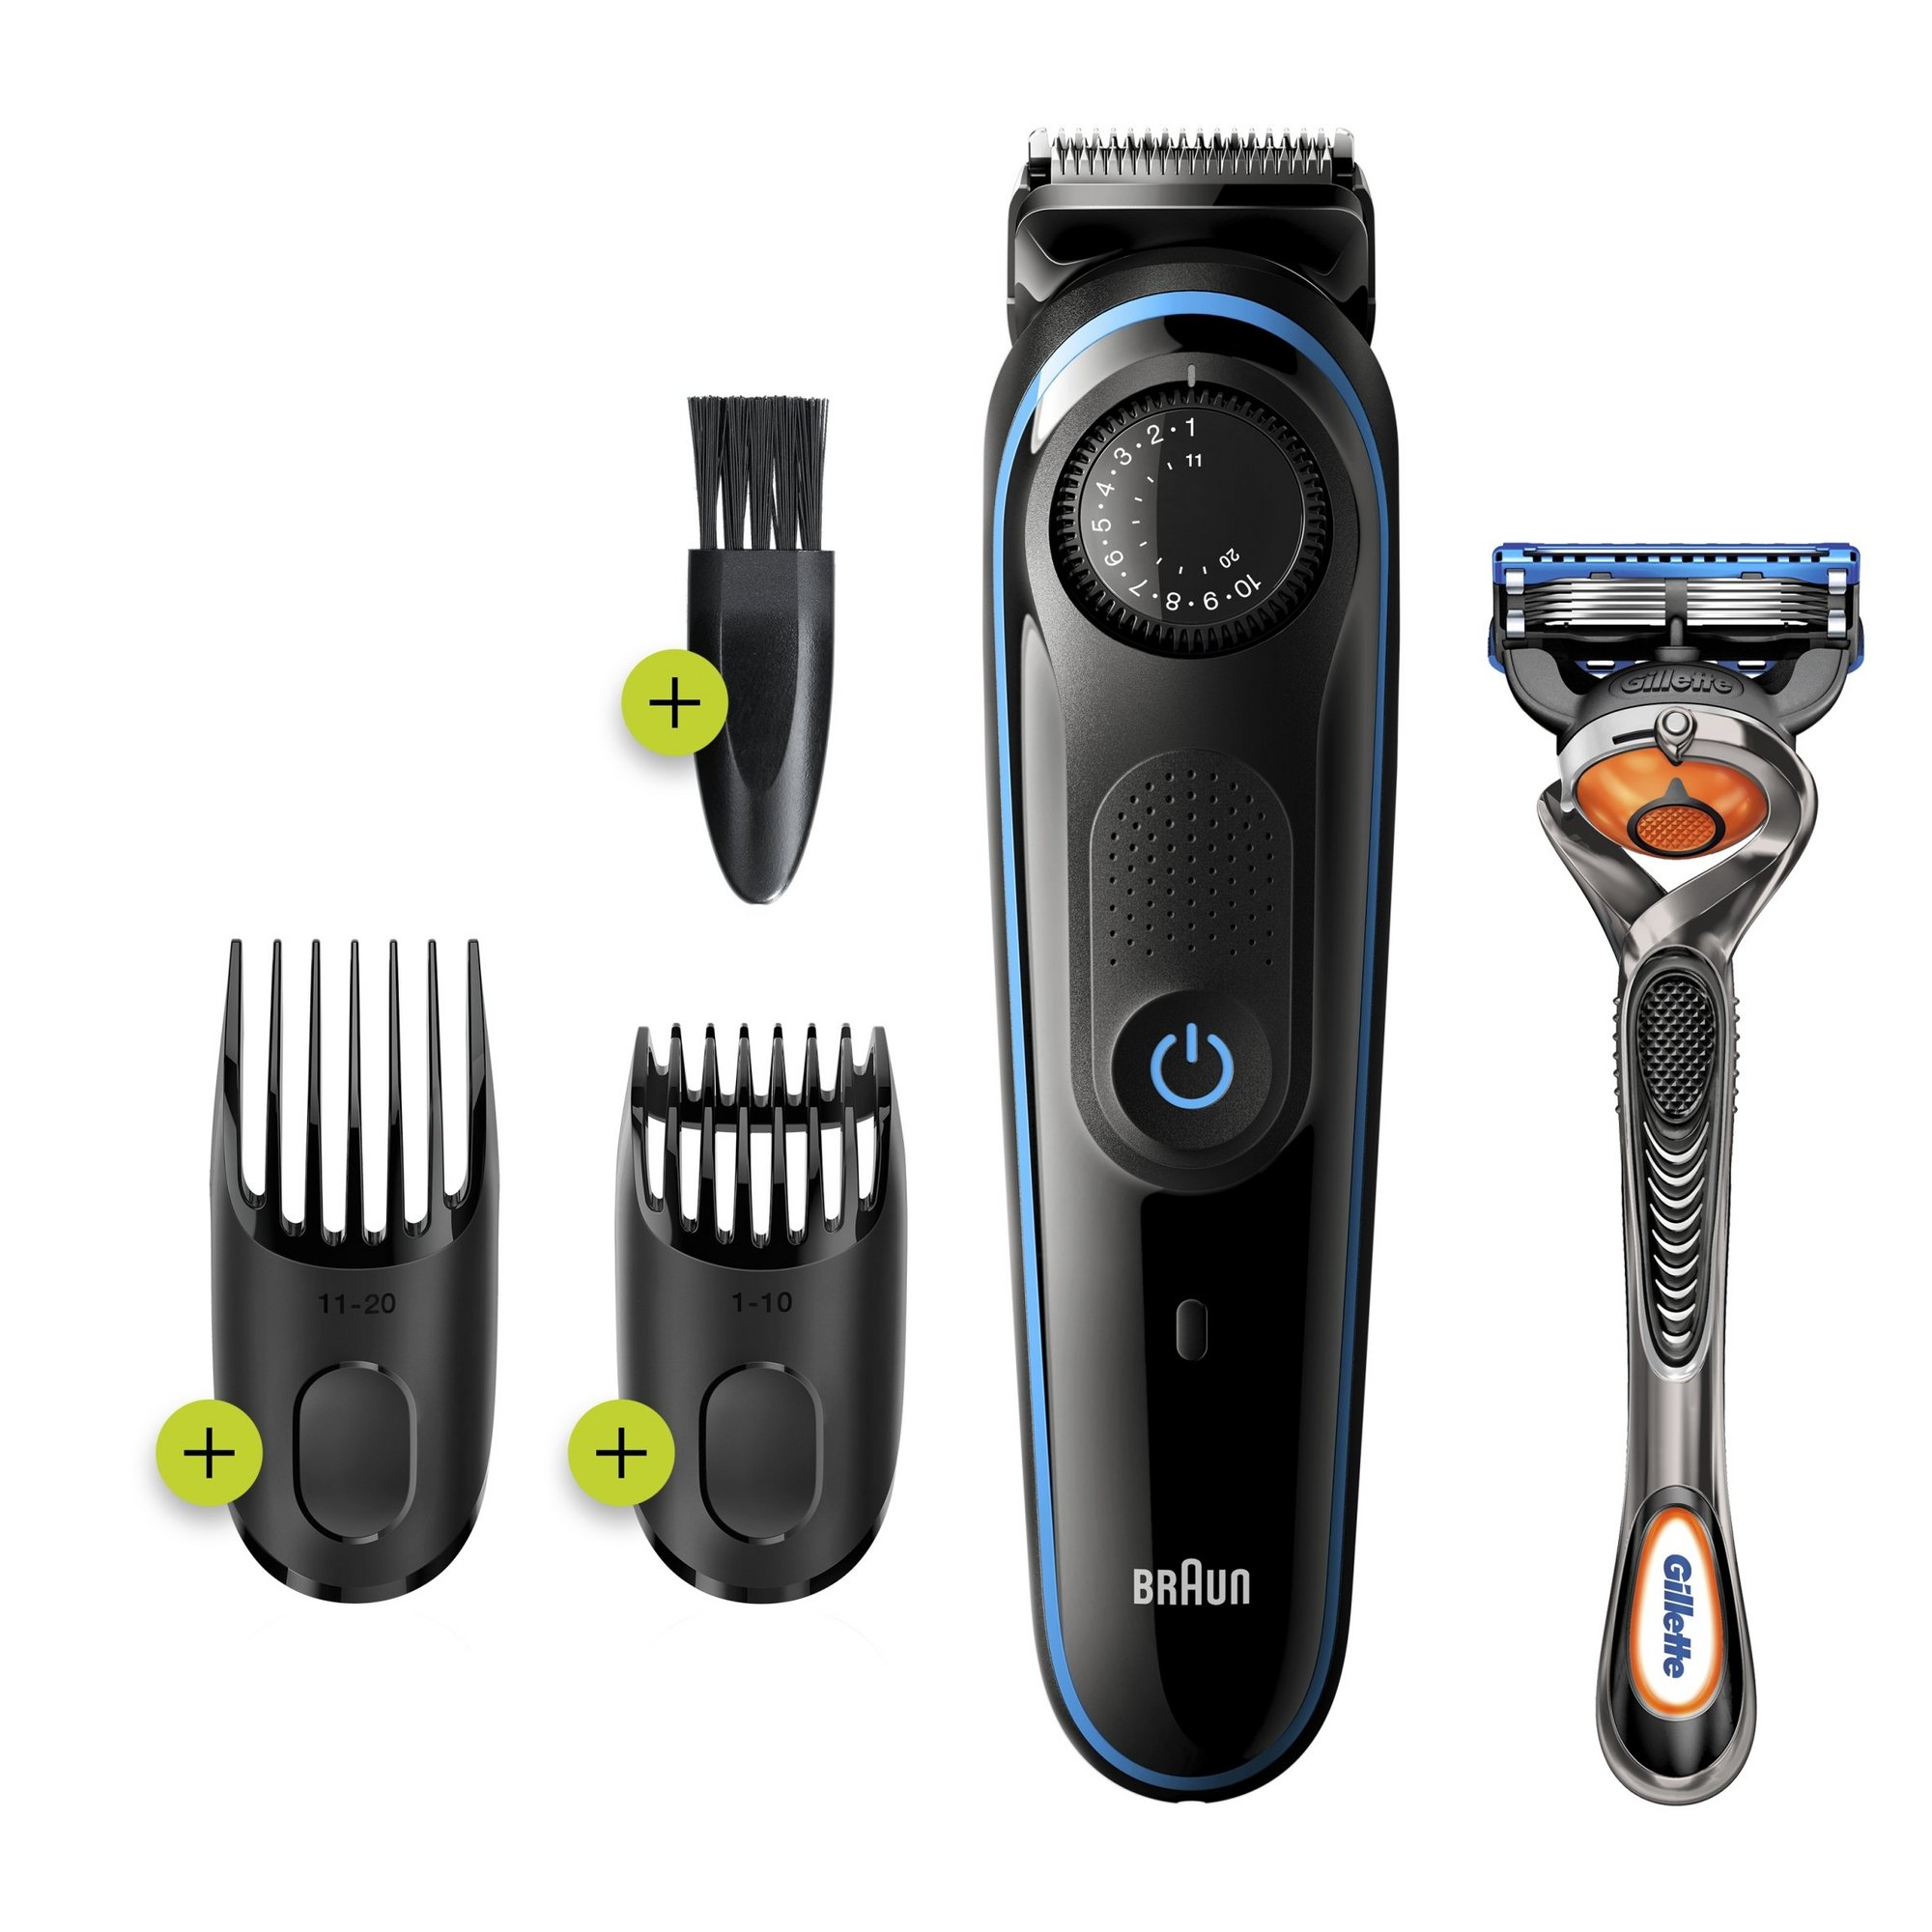 Image of Braun BT3240 Hair Clipper and Beard Trimmer